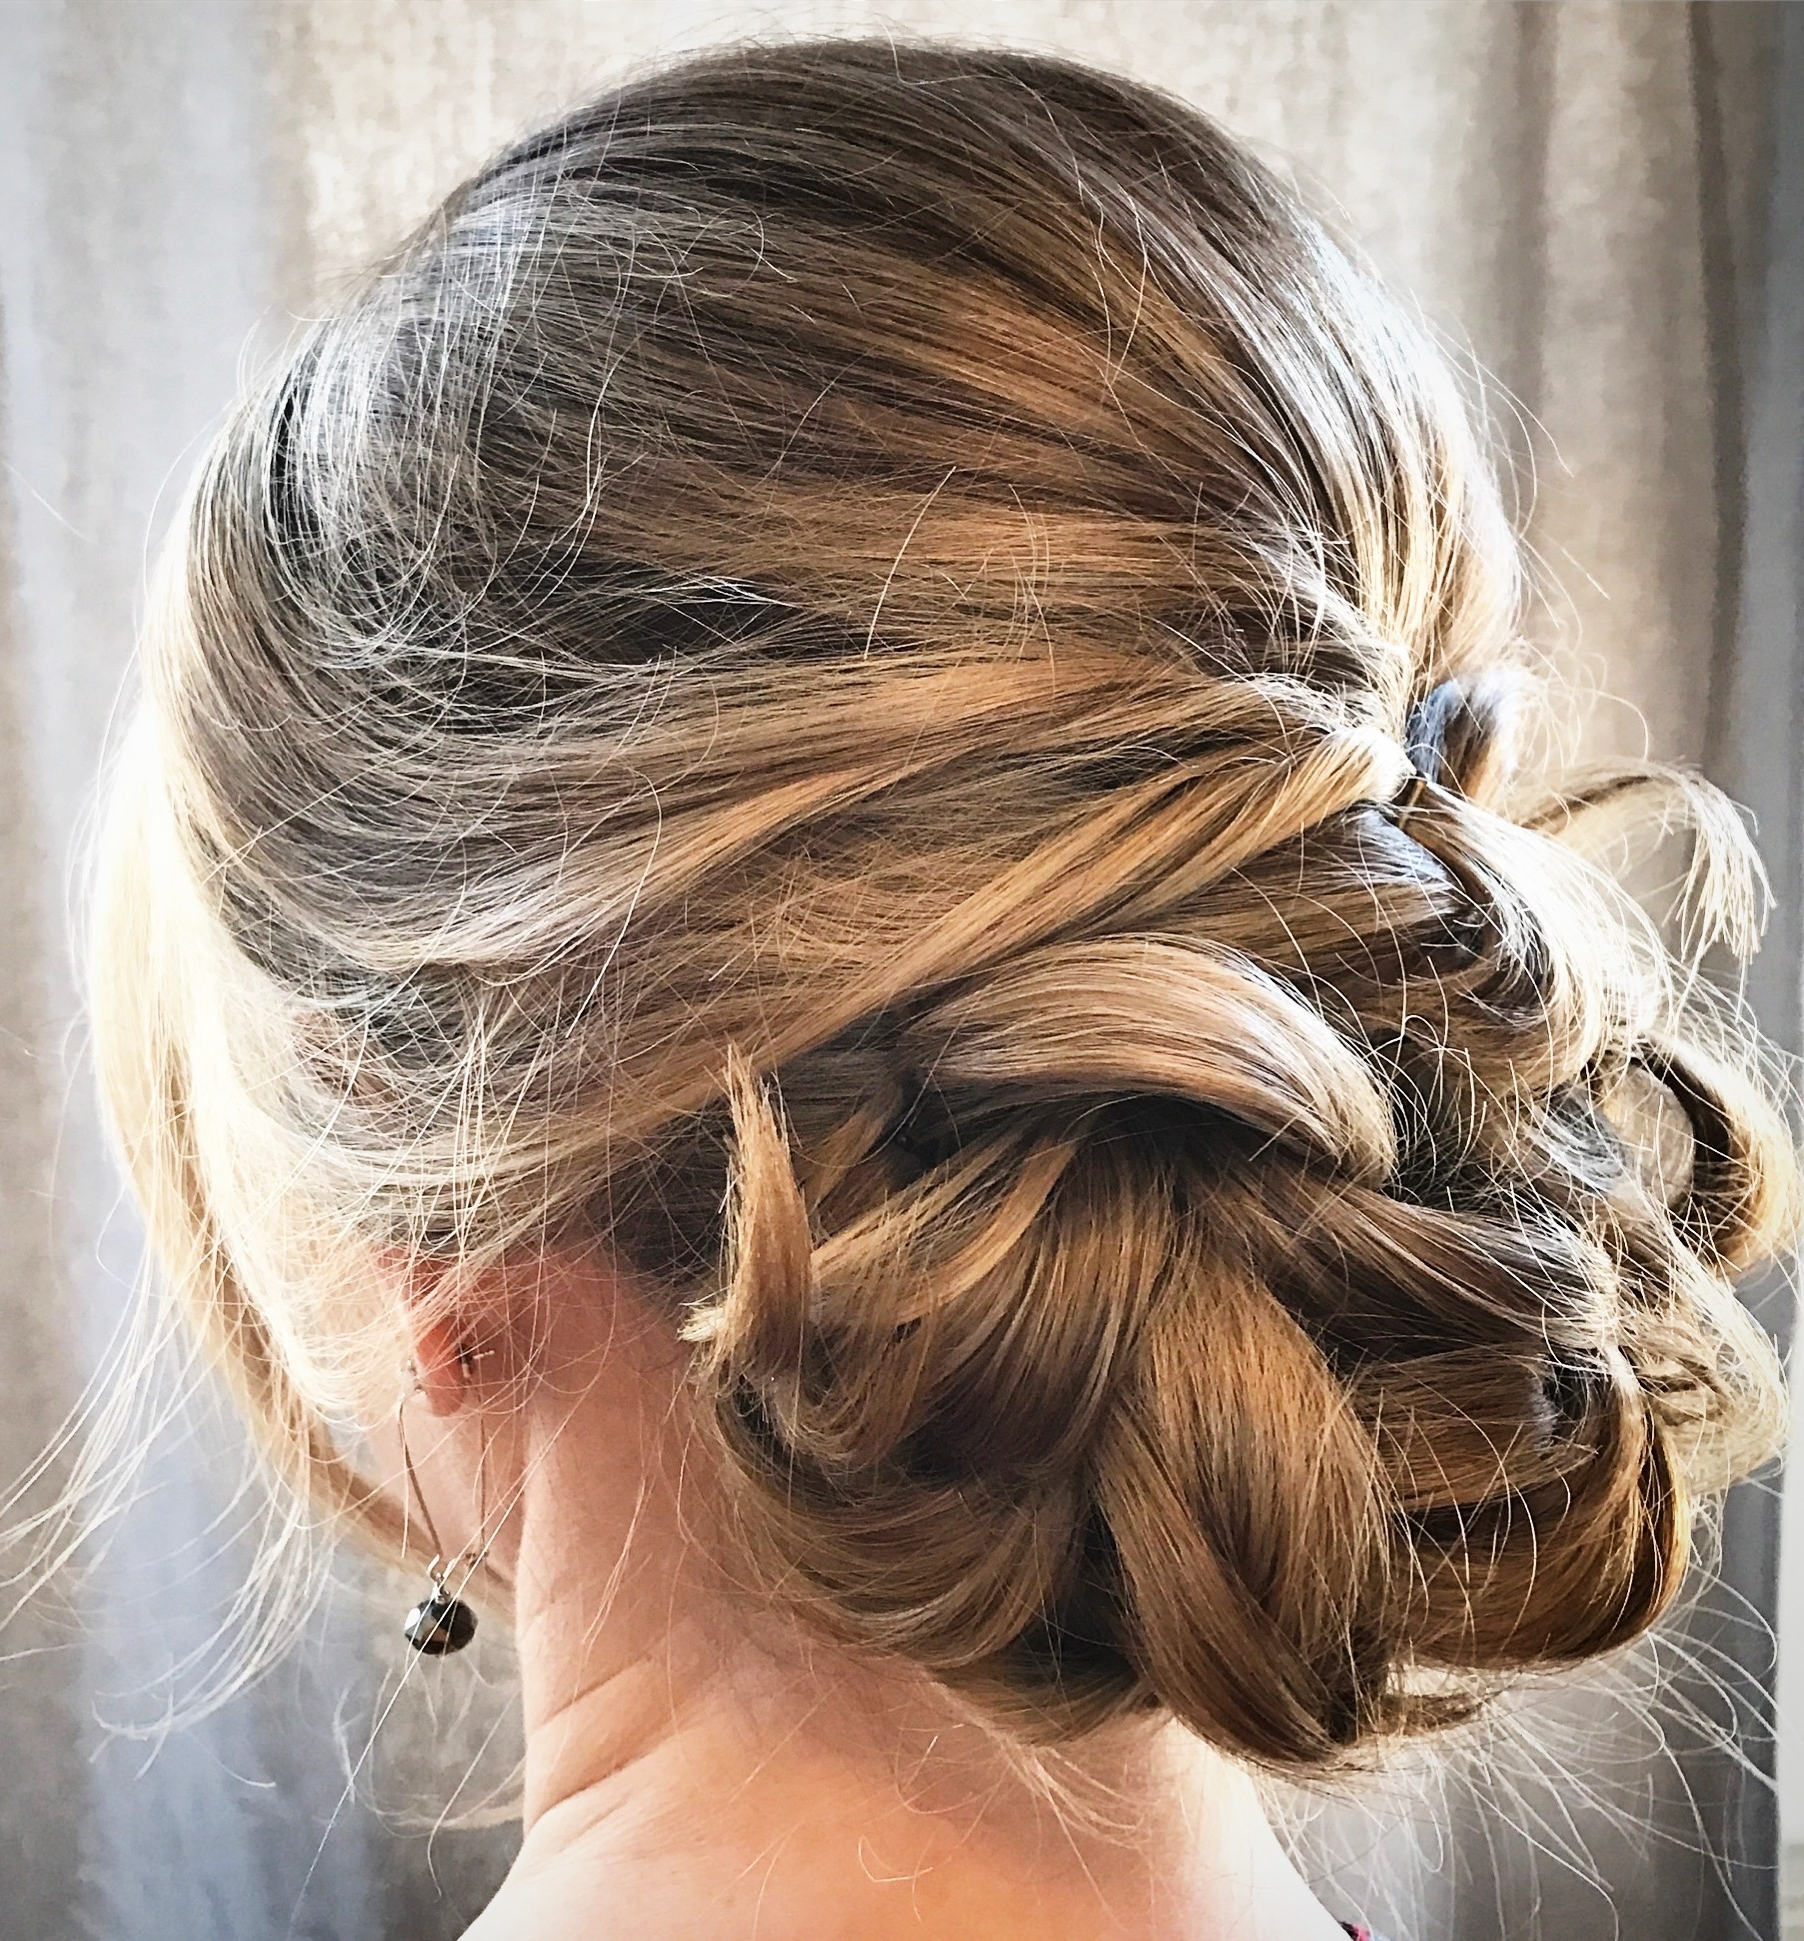 Hair Salon Services - Women's Up-Do & Braids